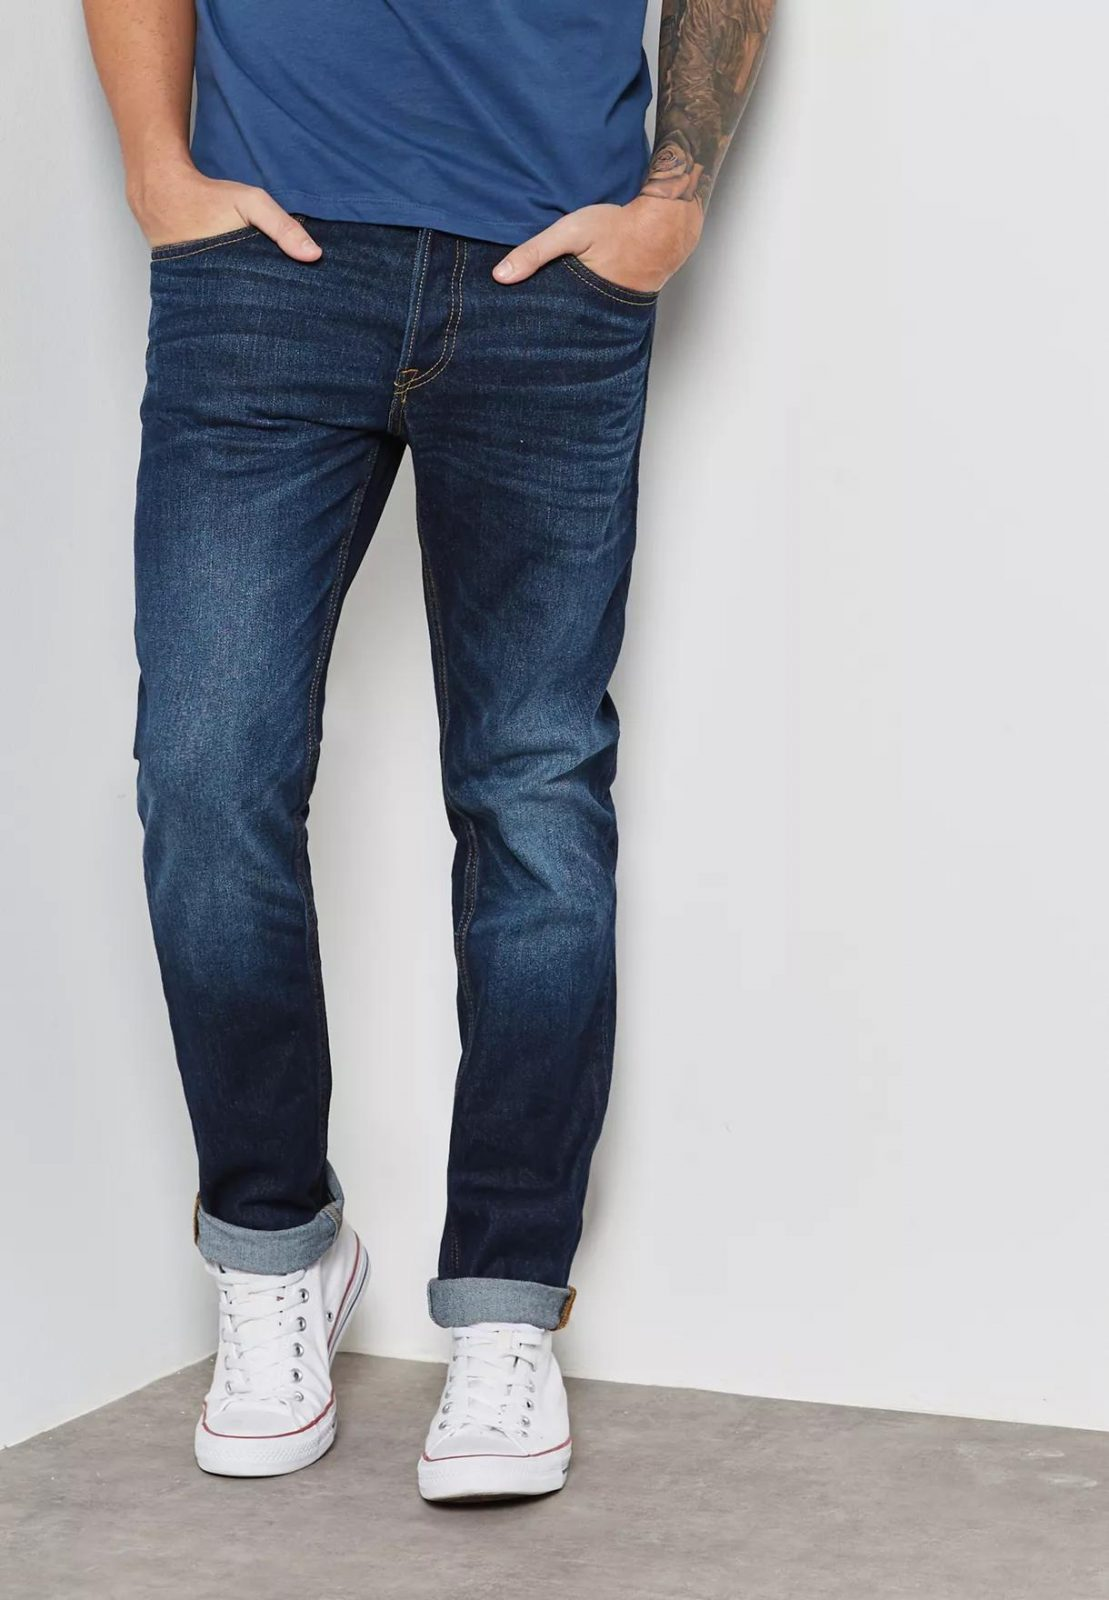 Quần jeans nam Jack & Jones JAJ-J02 Tim Slim Fit Jeans